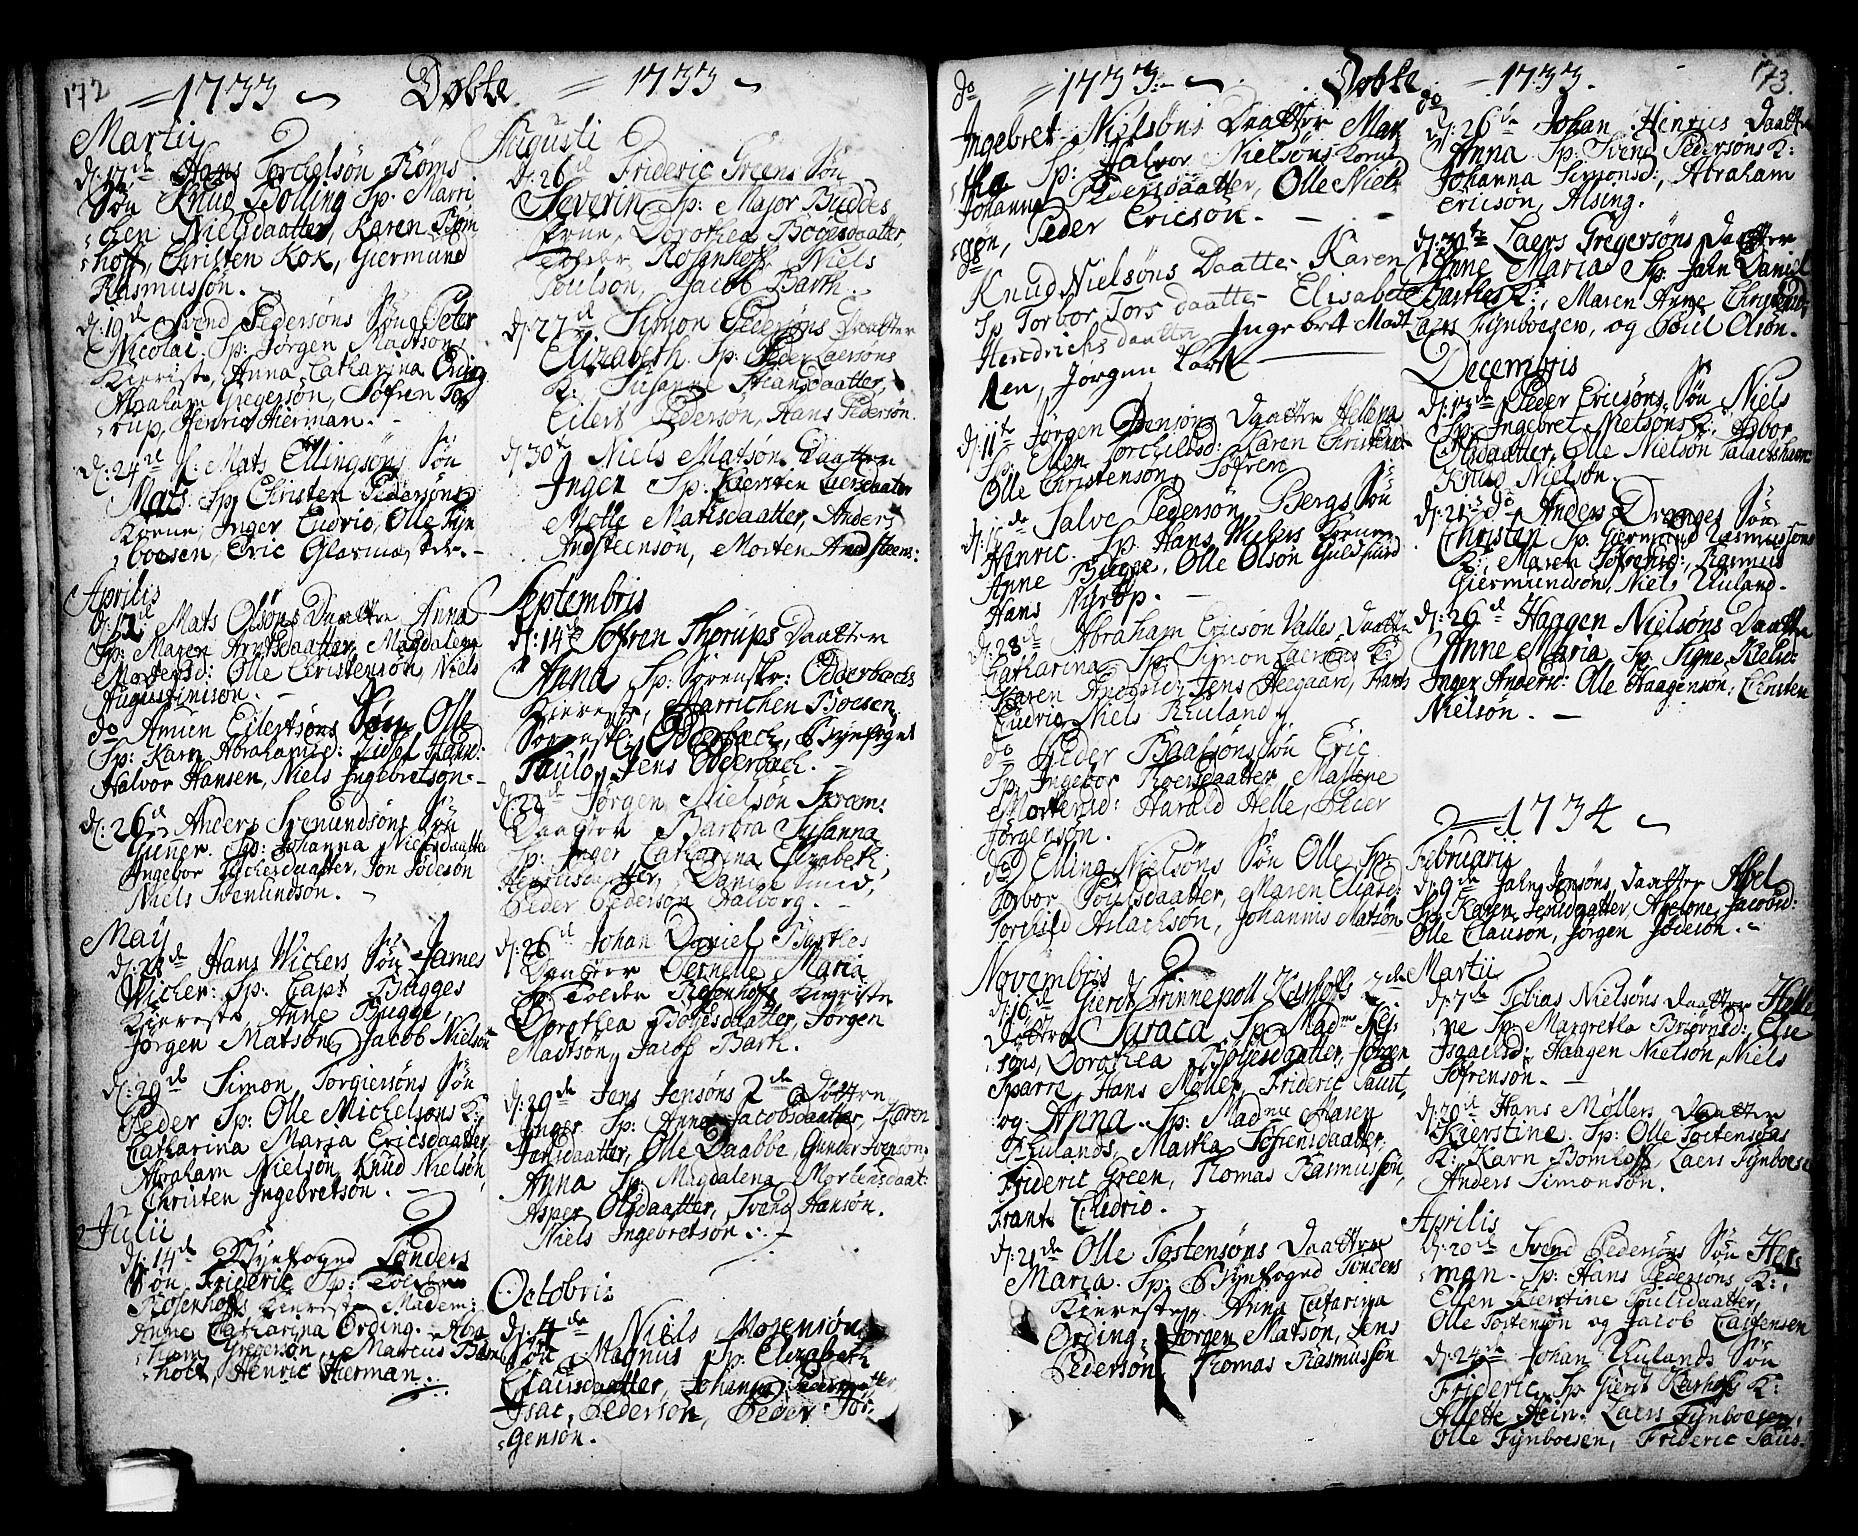 SAKO, Kragerø kirkebøker, F/Fa/L0001: Ministerialbok nr. 1, 1702-1766, s. 172-173